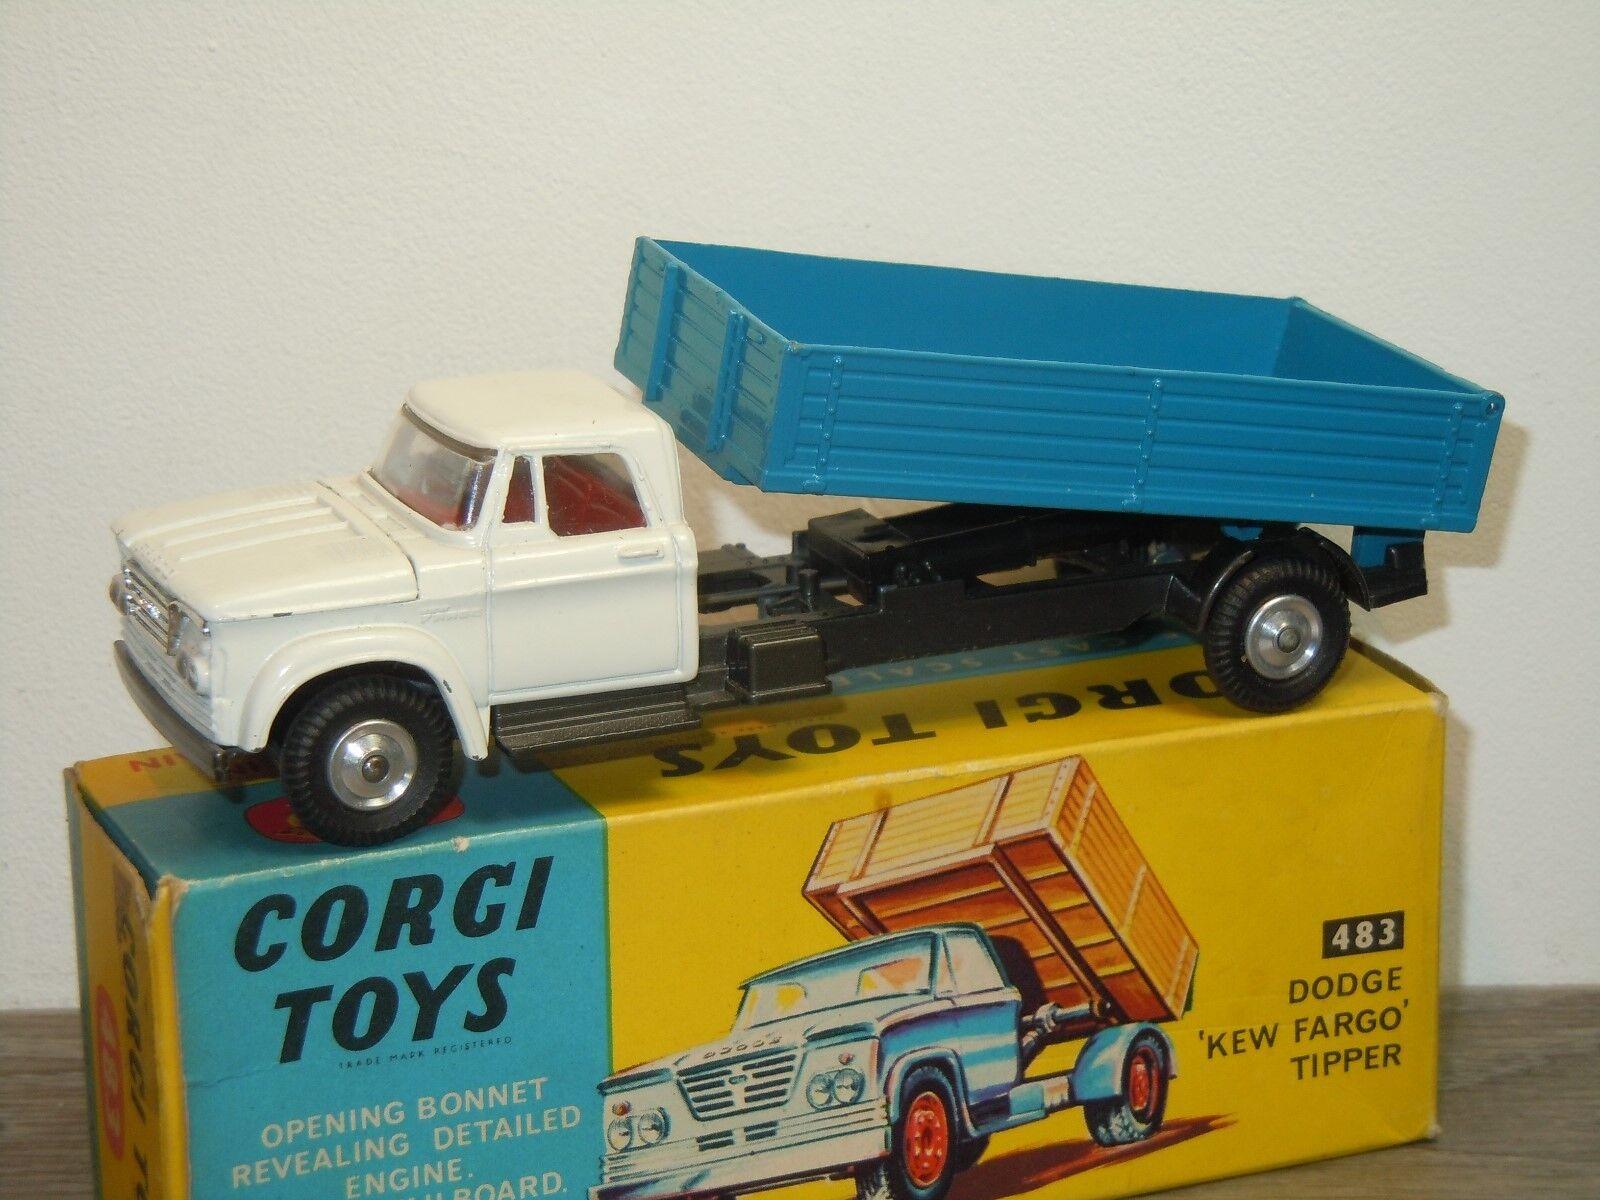 Dodge Kew Fargo Tipper - Corgi Toys 483 England in Box 35477